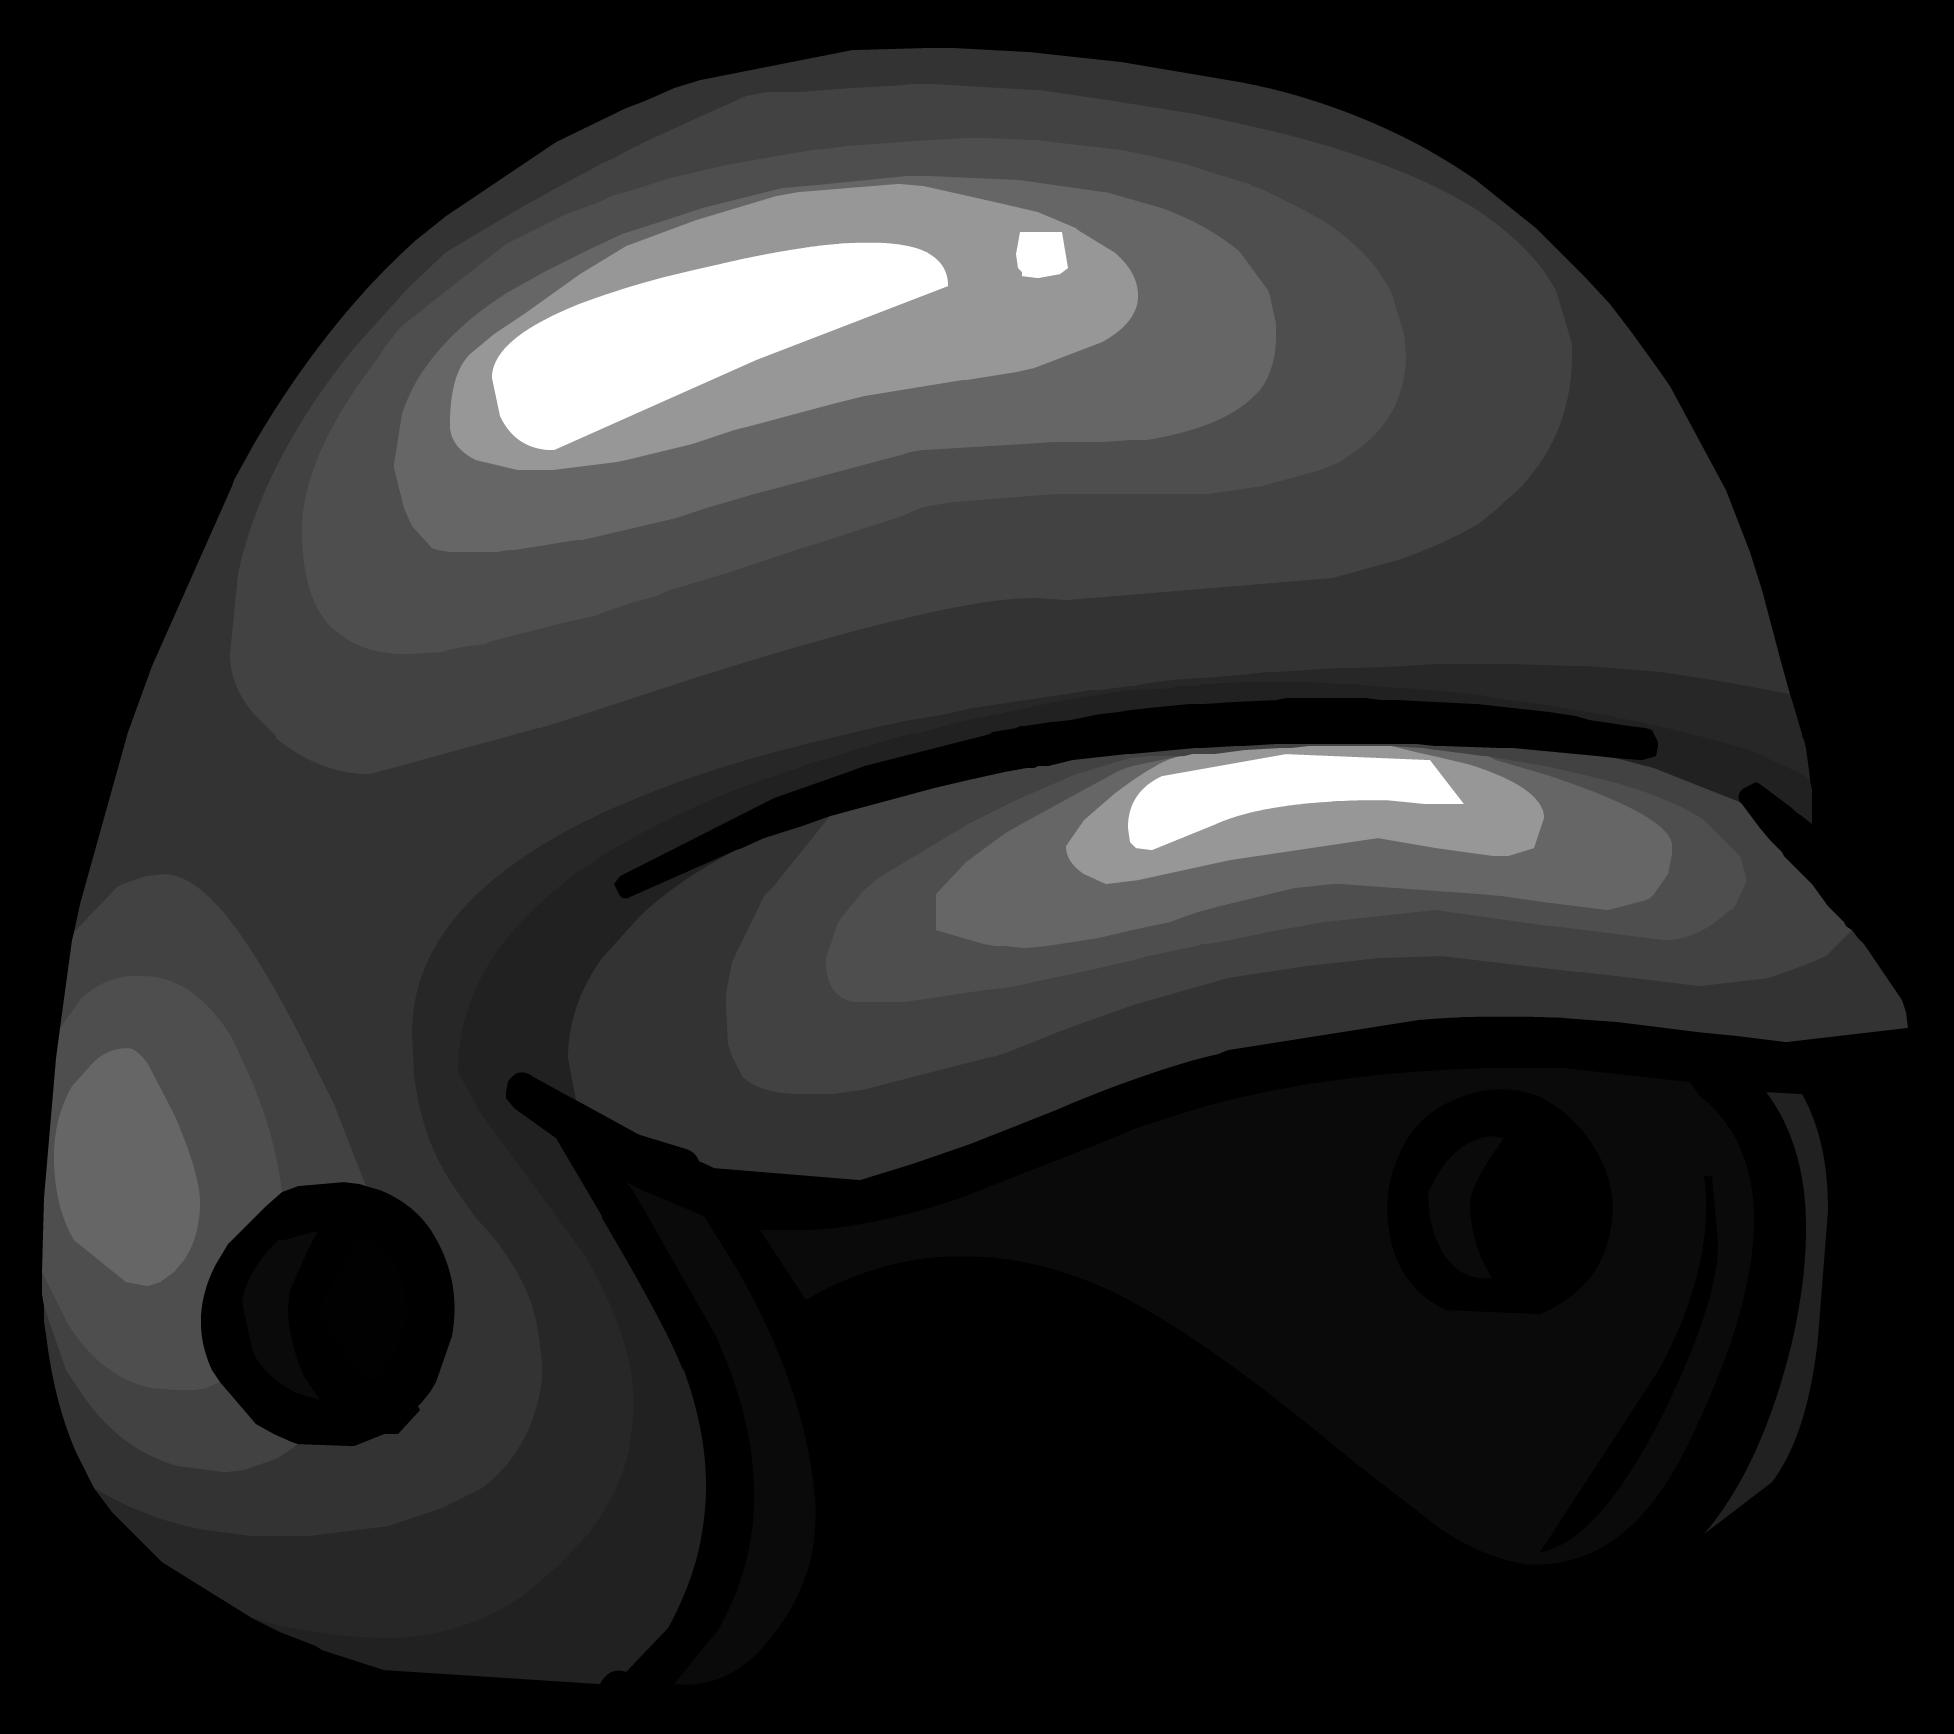 Softball clipart gear. Helmet baseball free on